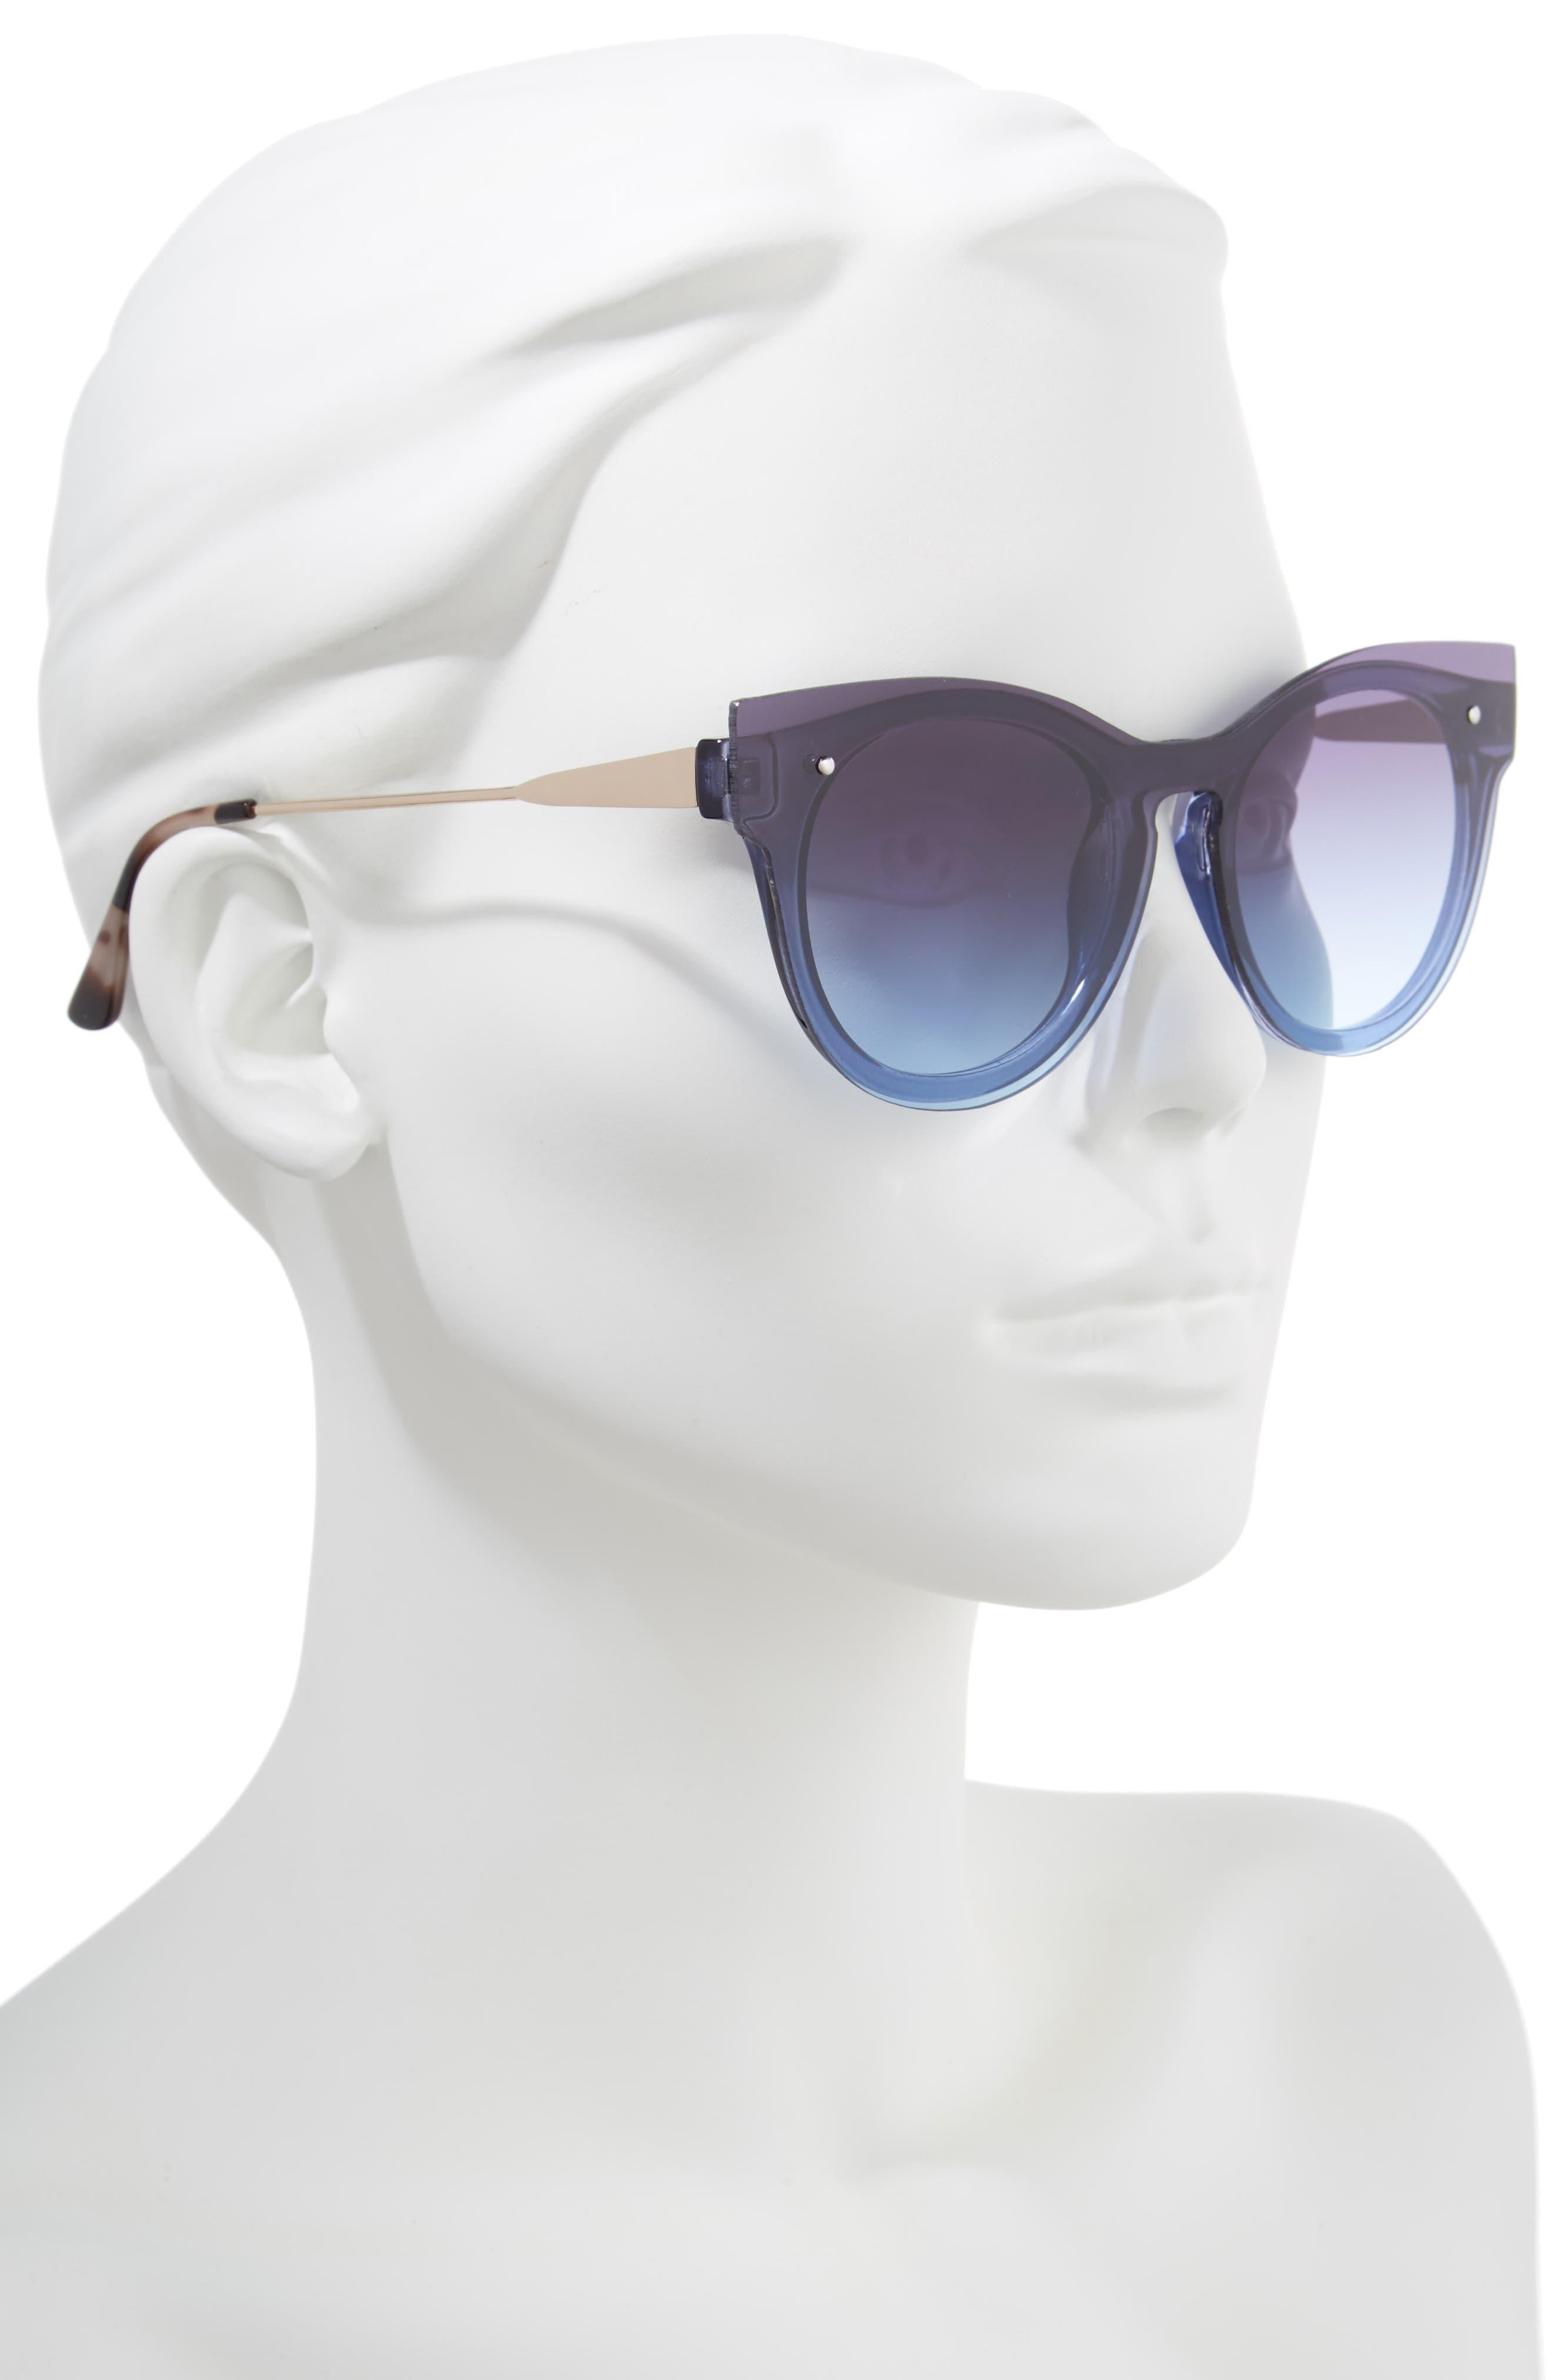 51mm Flat Cat Eye Sunglasses,                             Alternate thumbnail 2, color,                             Gold/ Blue